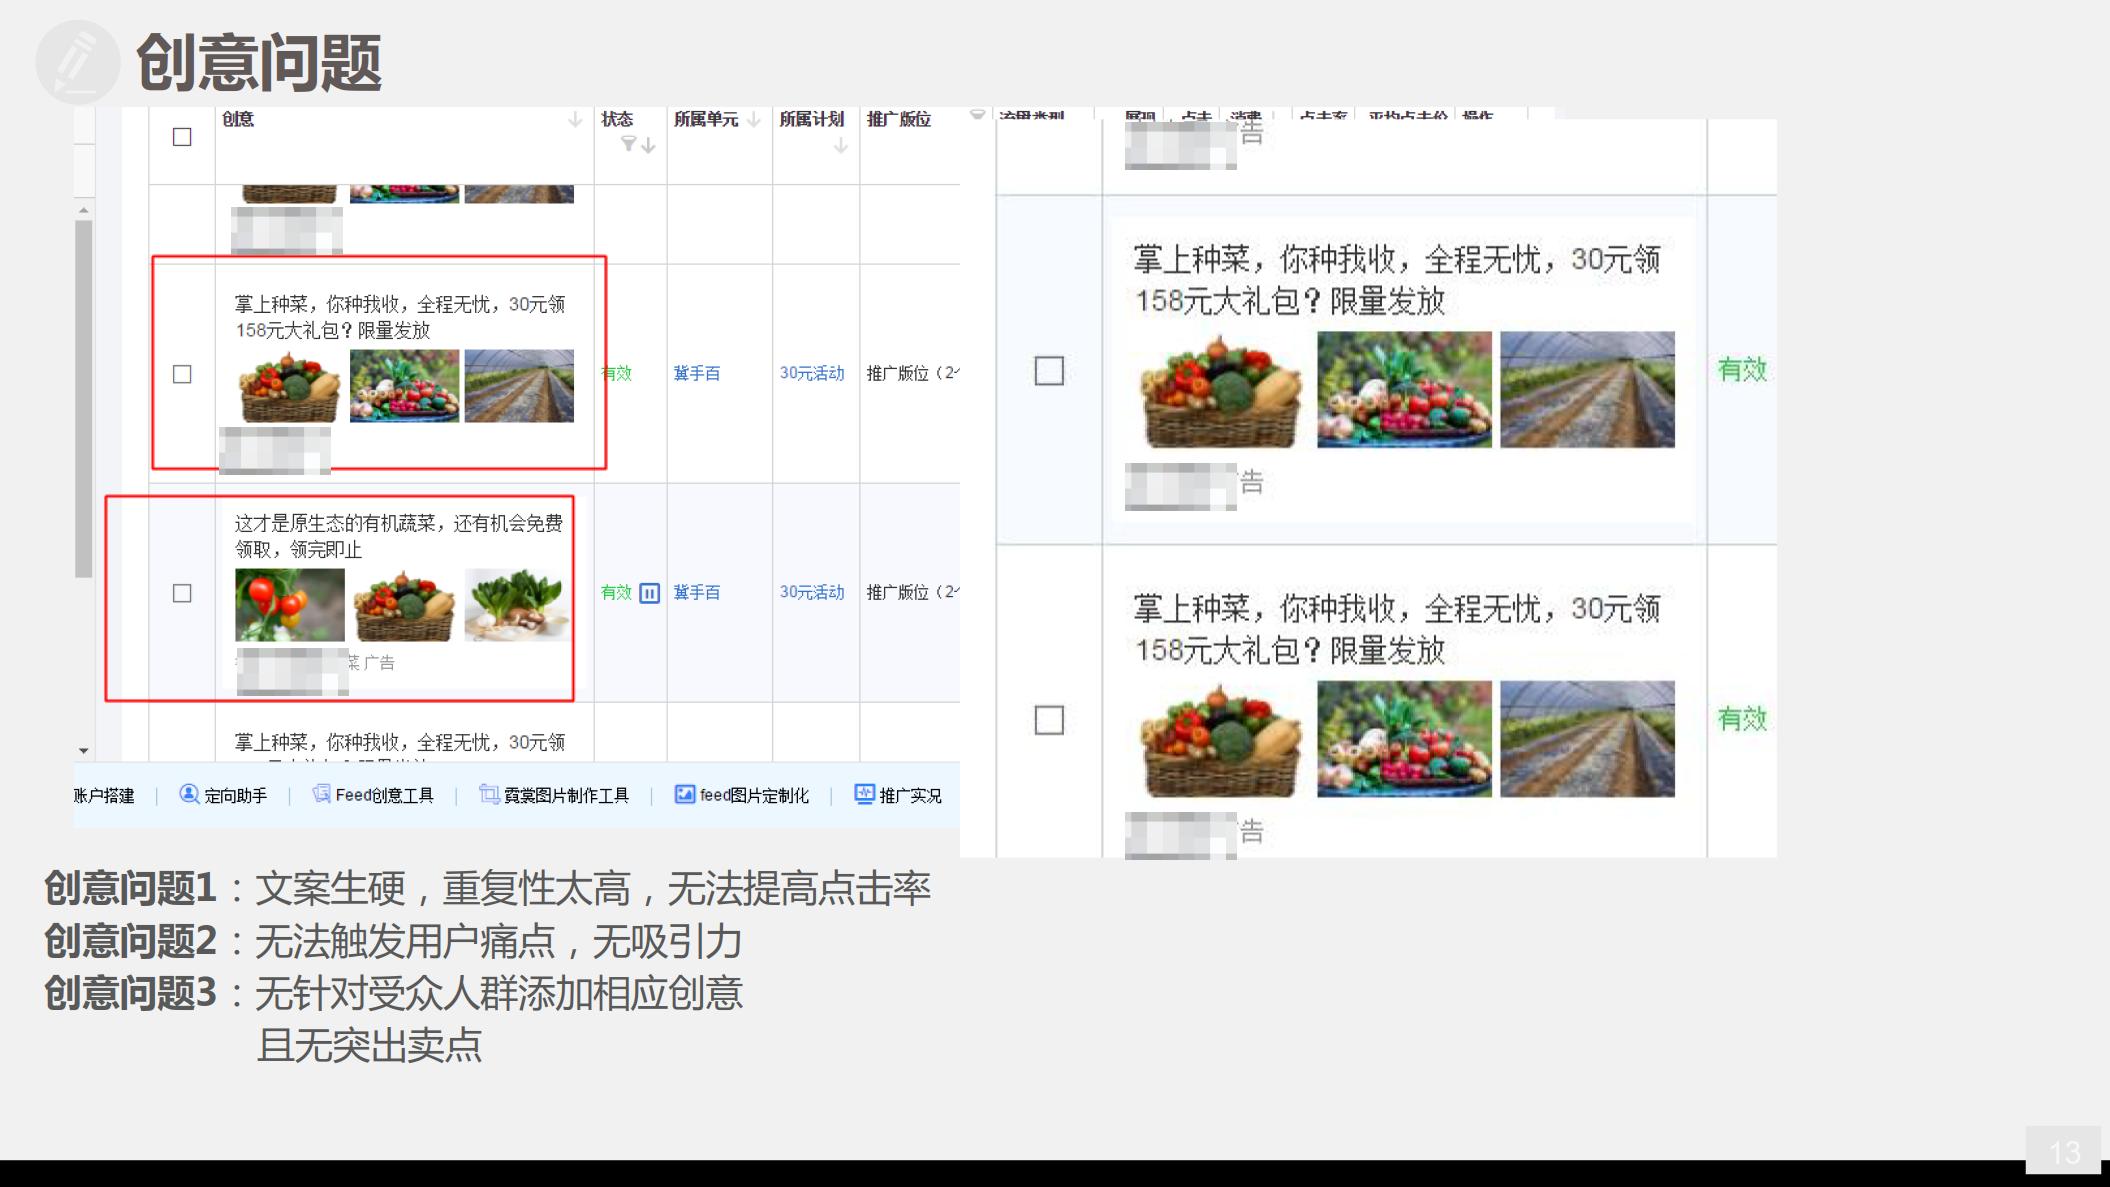 F1+vbj村小爱+软件游戏+张洁0608_13.png